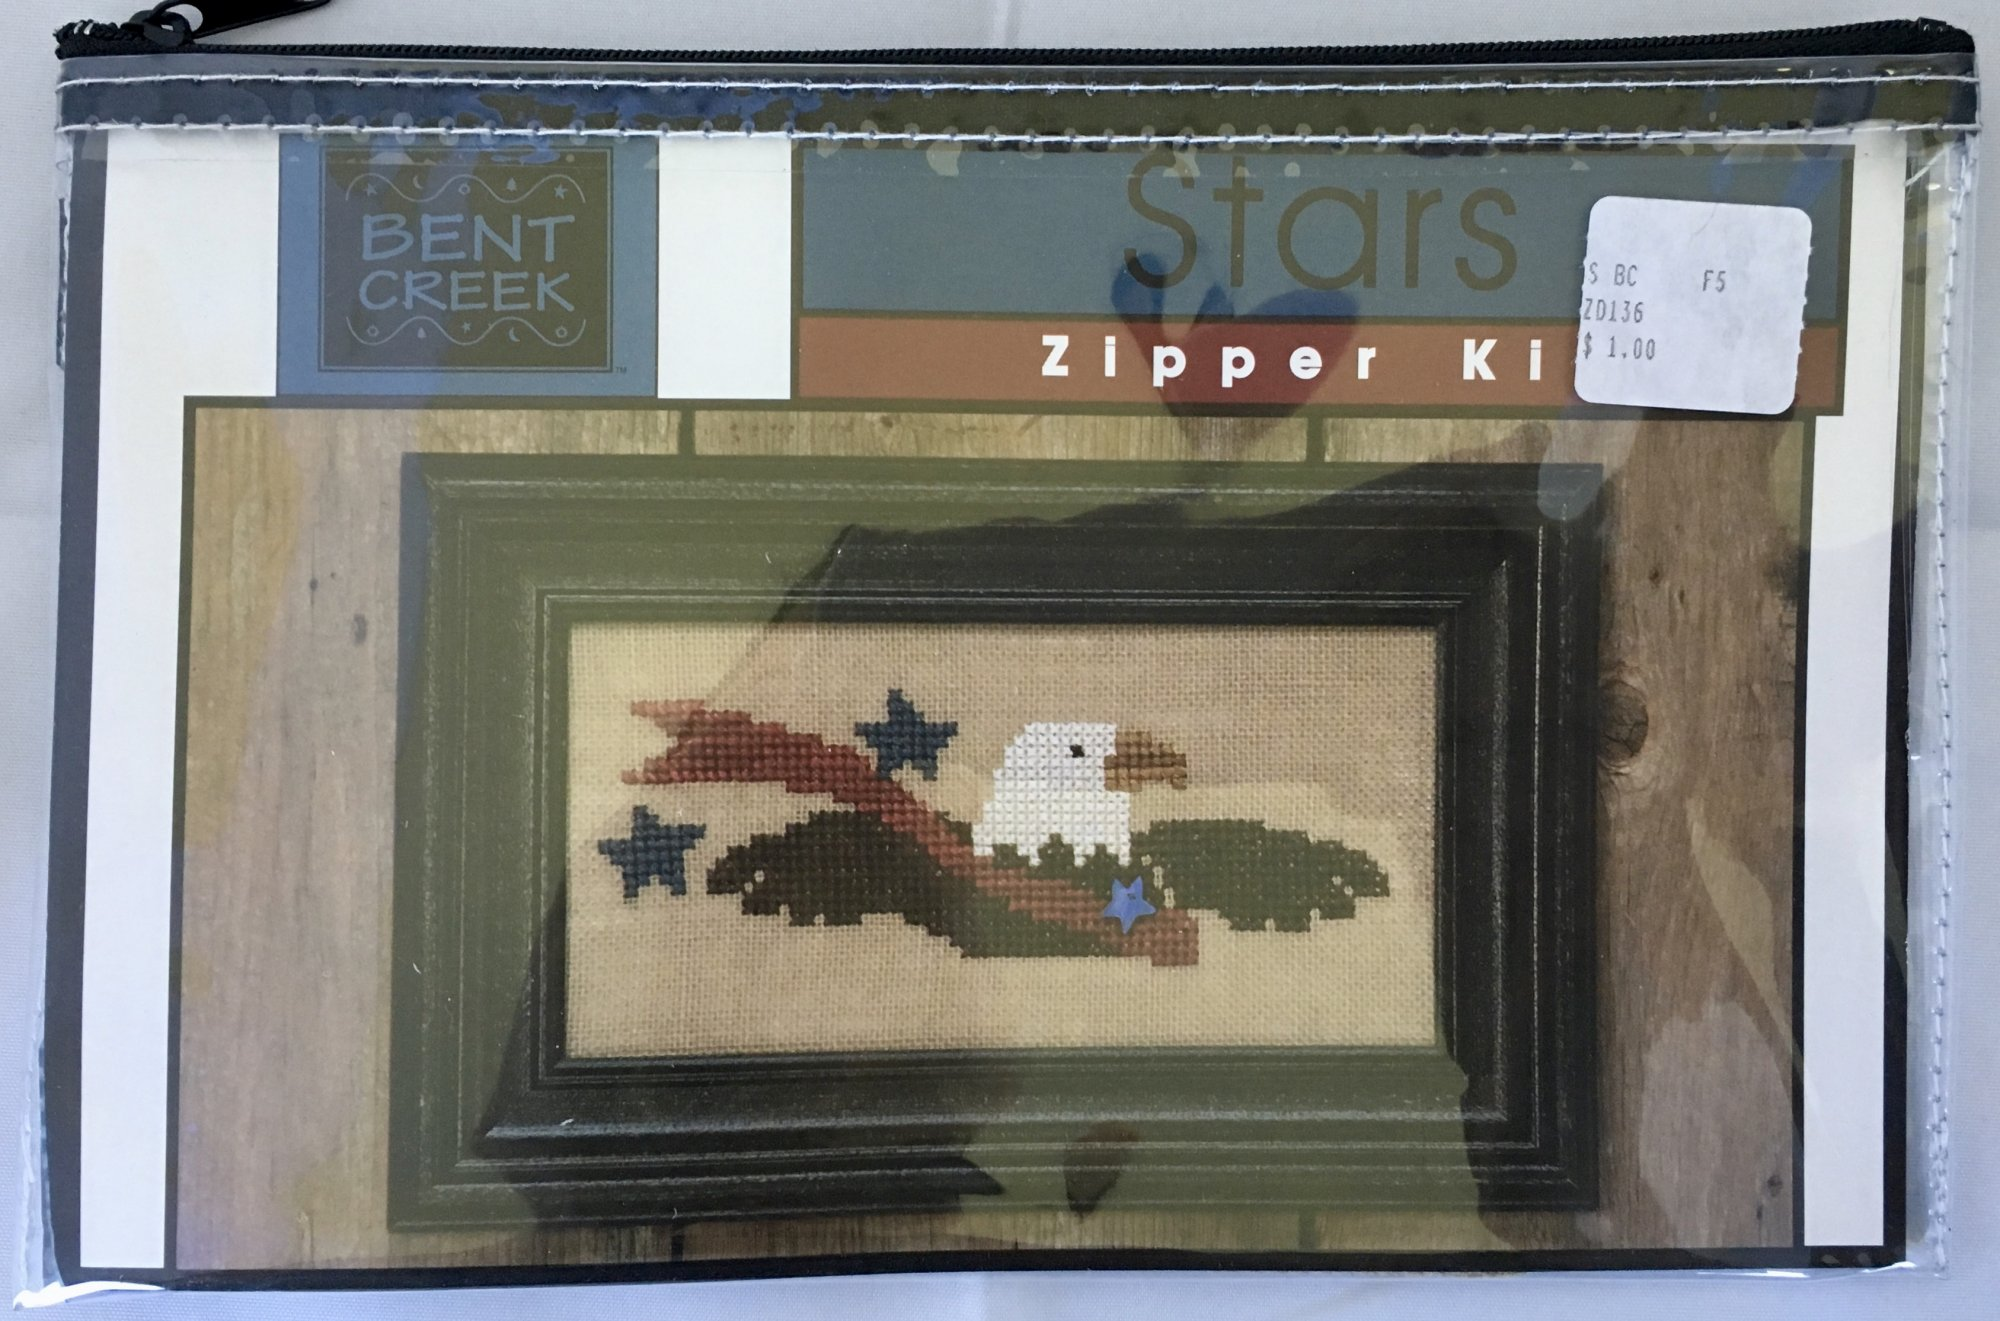 Bent Creek: Stars Zipper Kit